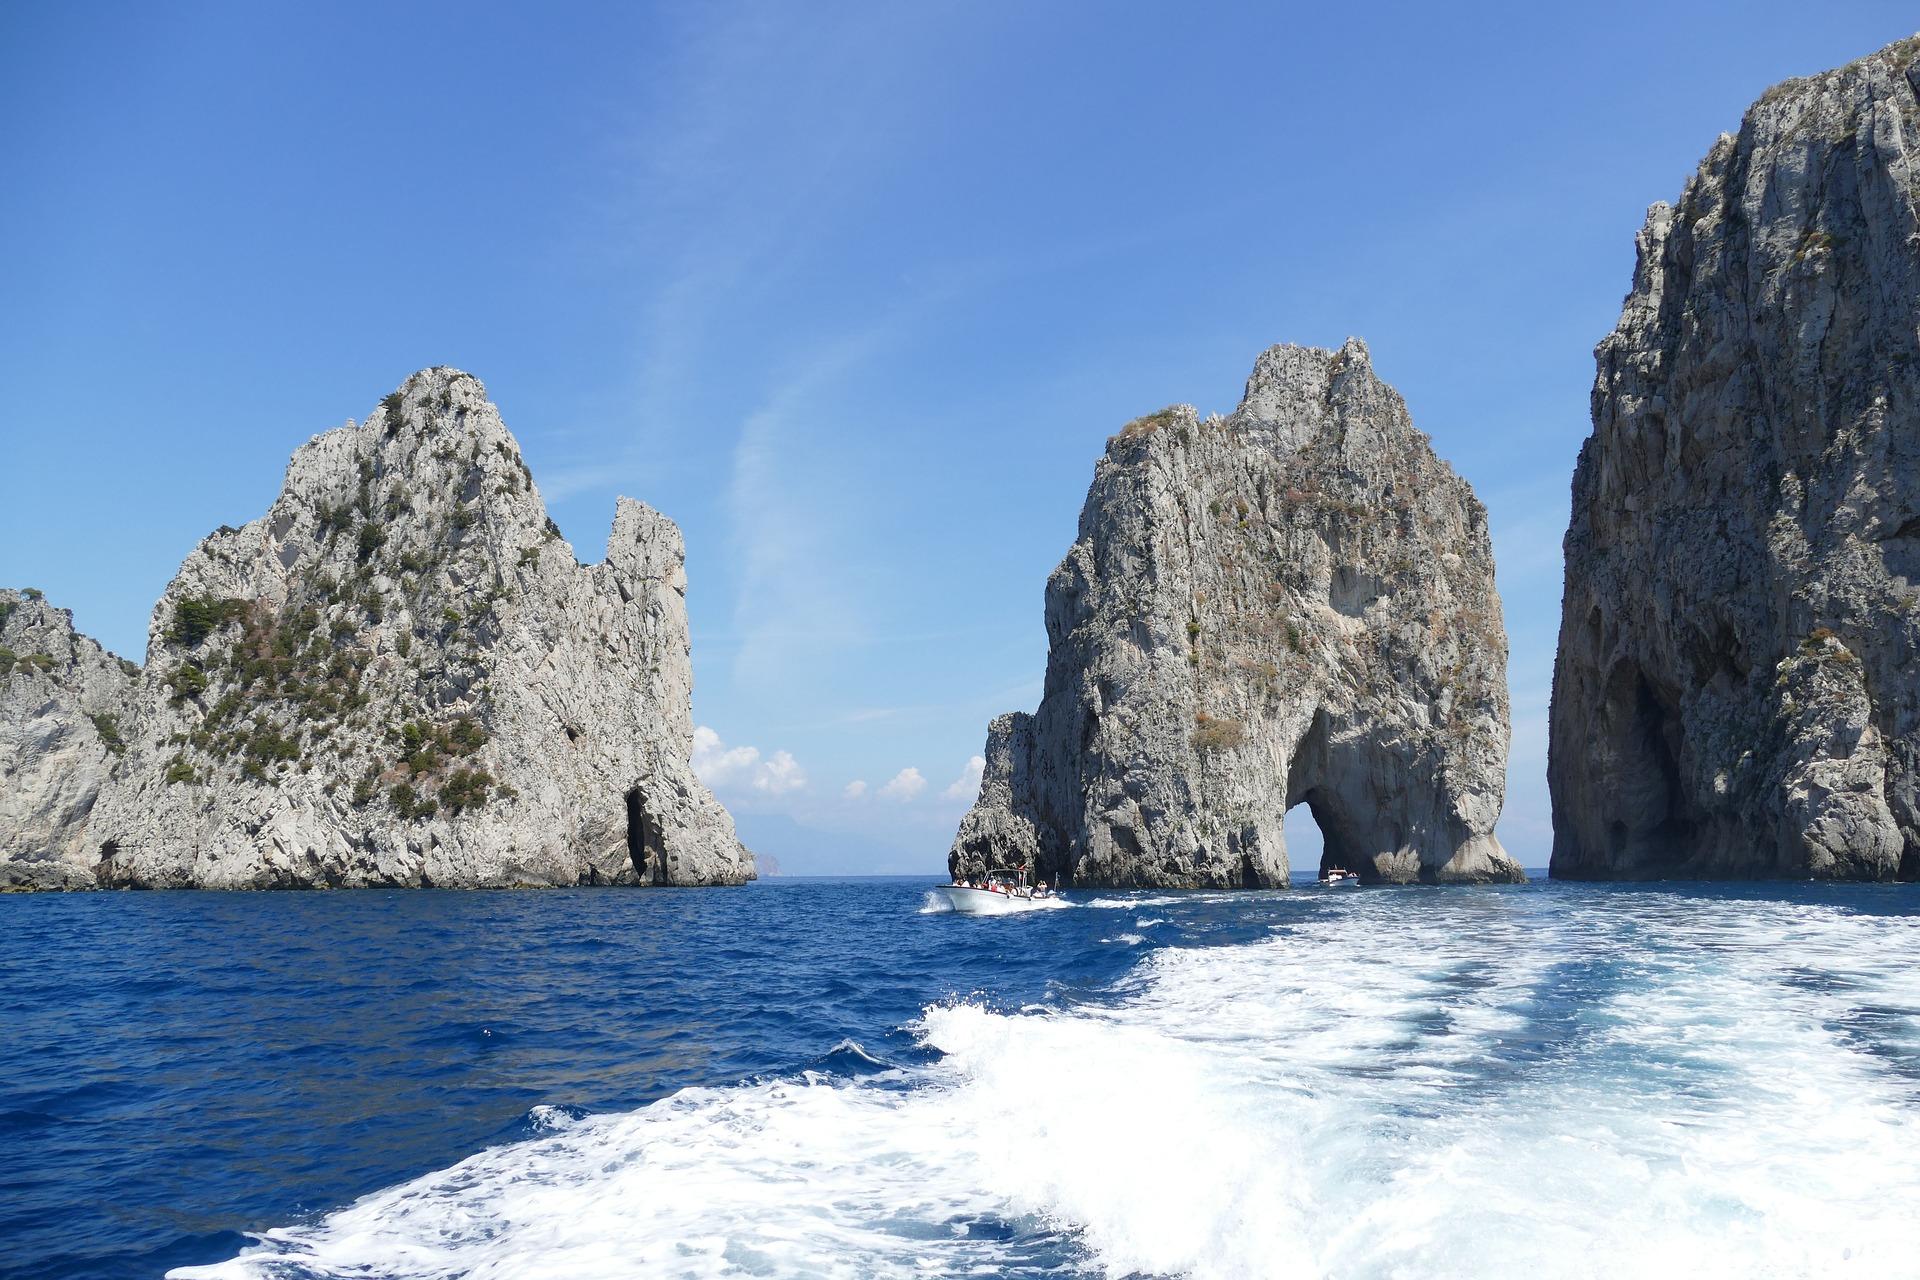 capri-island-boat-tour-capri-tour